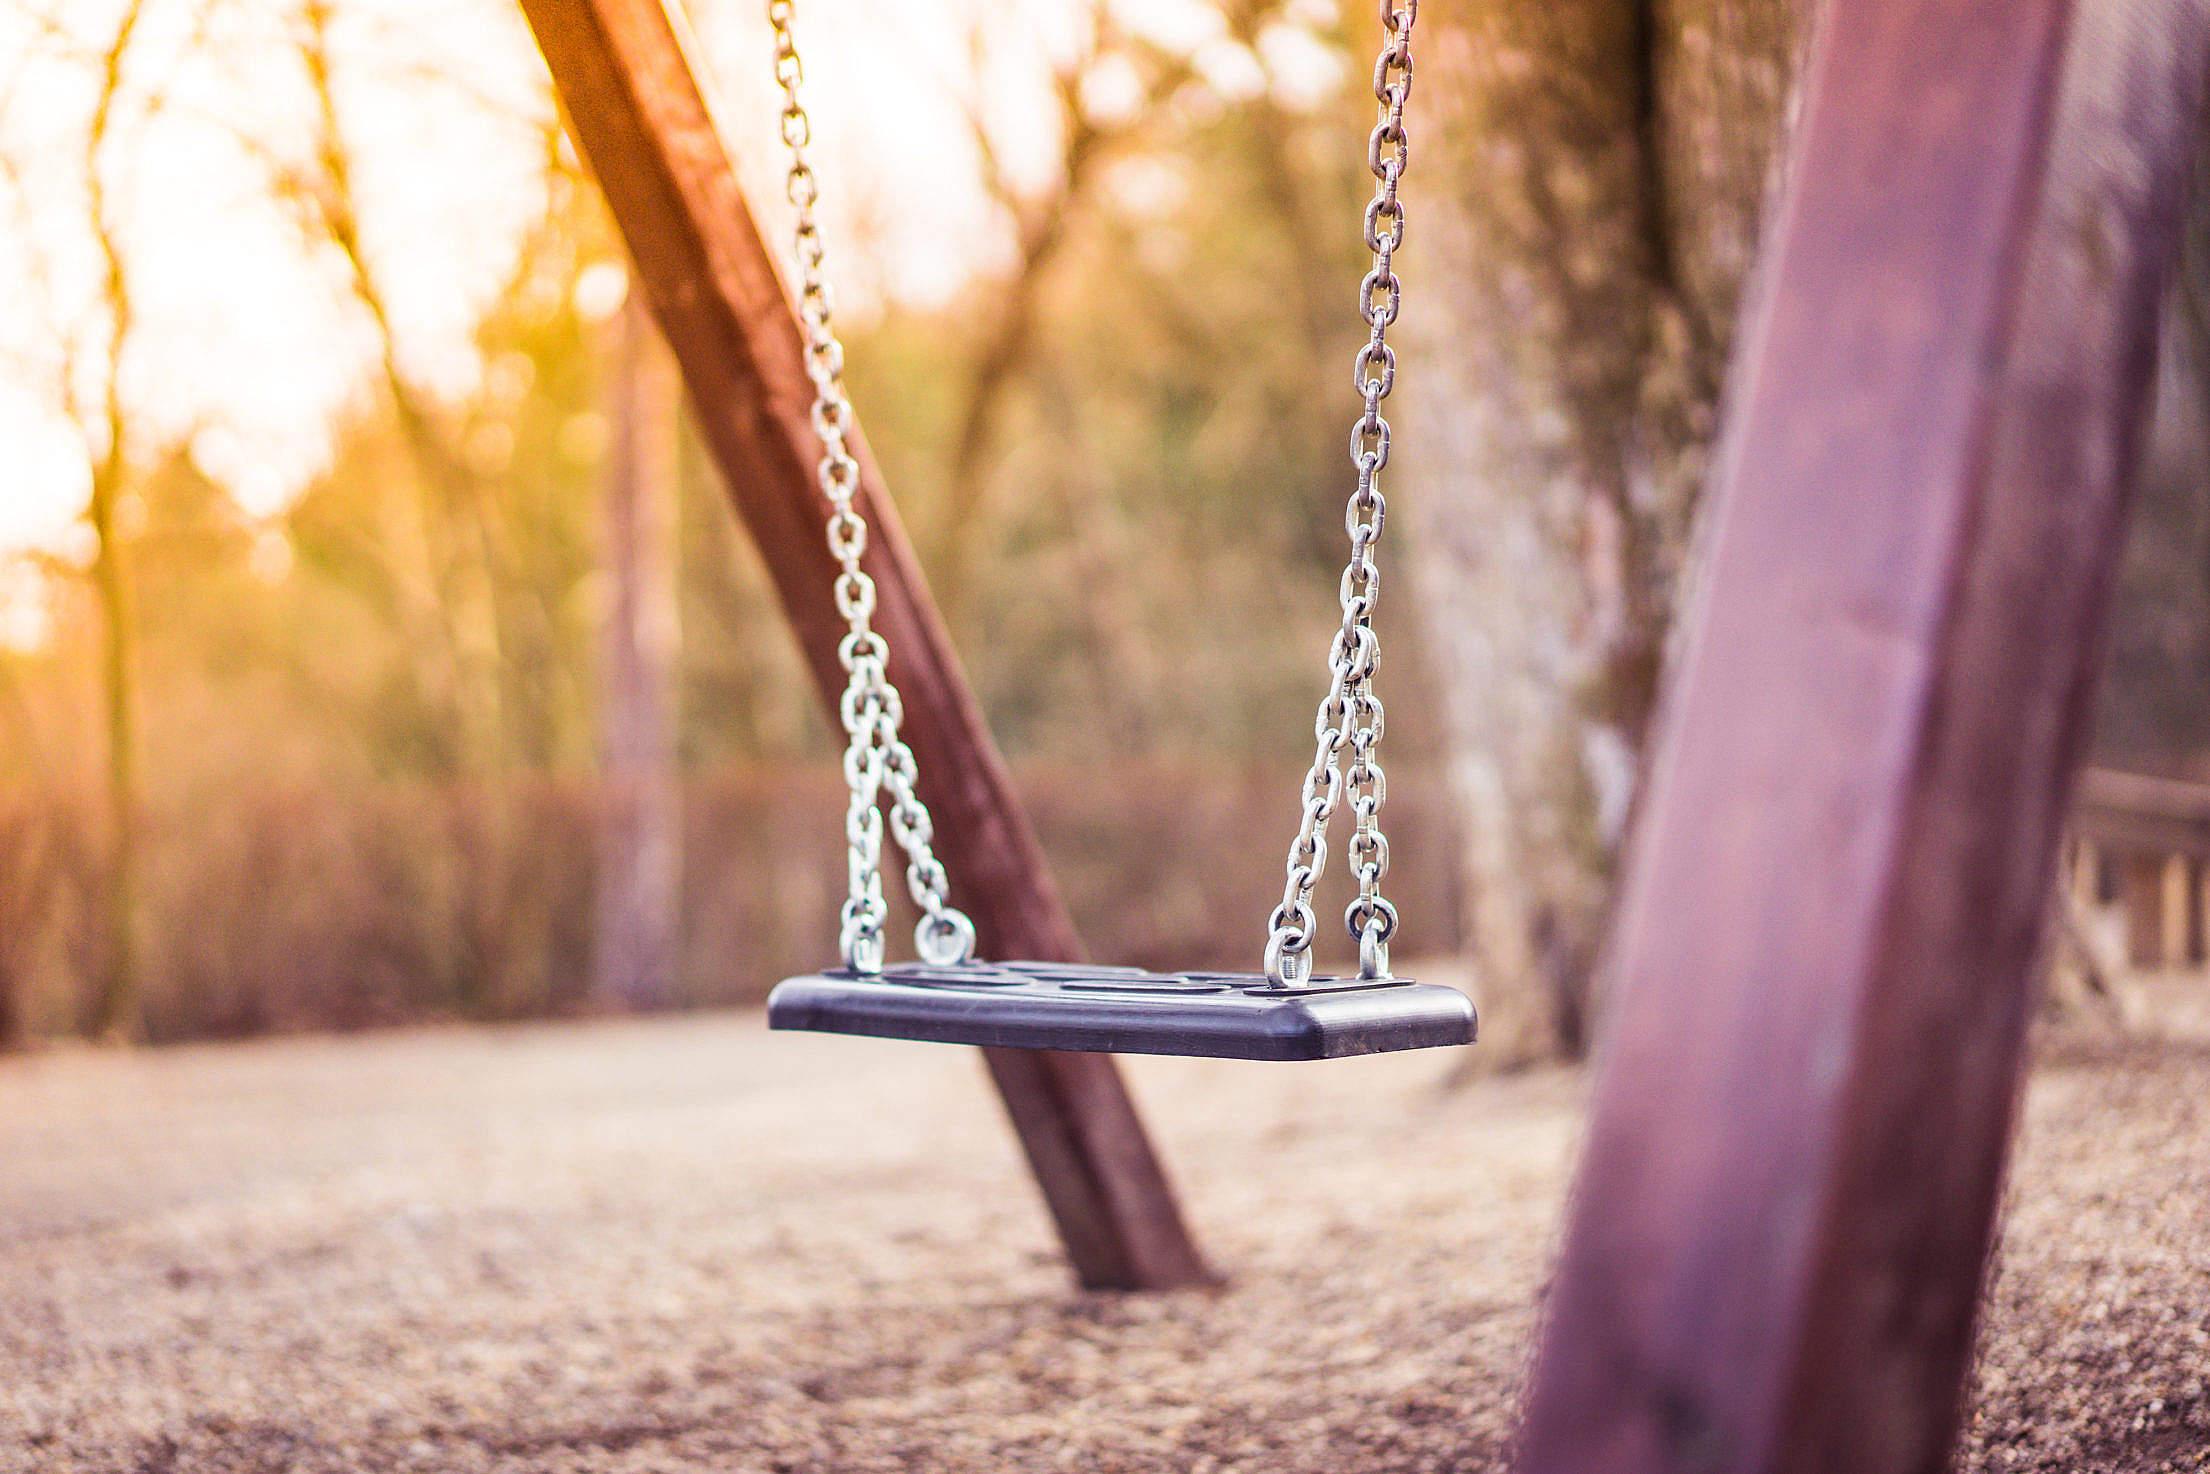 swing-for-kids-in-city-park-playground-2_free_stock_photos_picjumbo_dsc03309-2210x1474.jpg